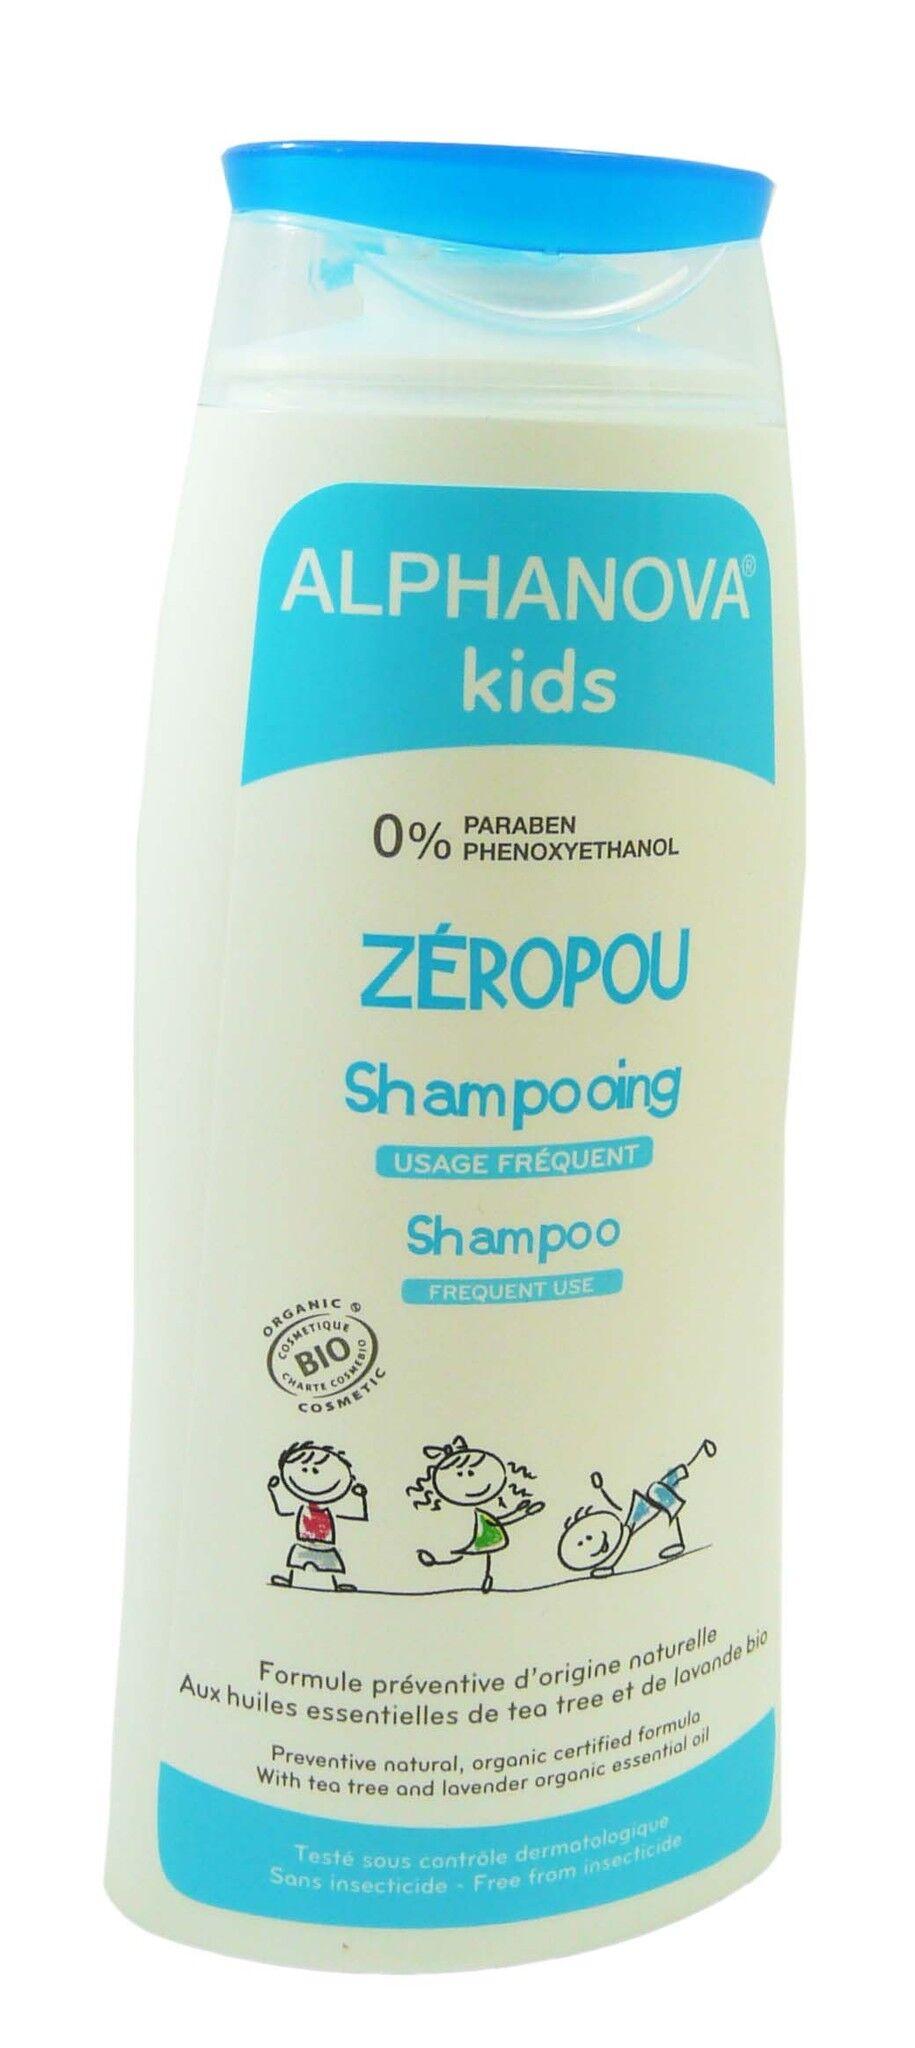 Alphanova kids zeropou shampooing bio 200ml